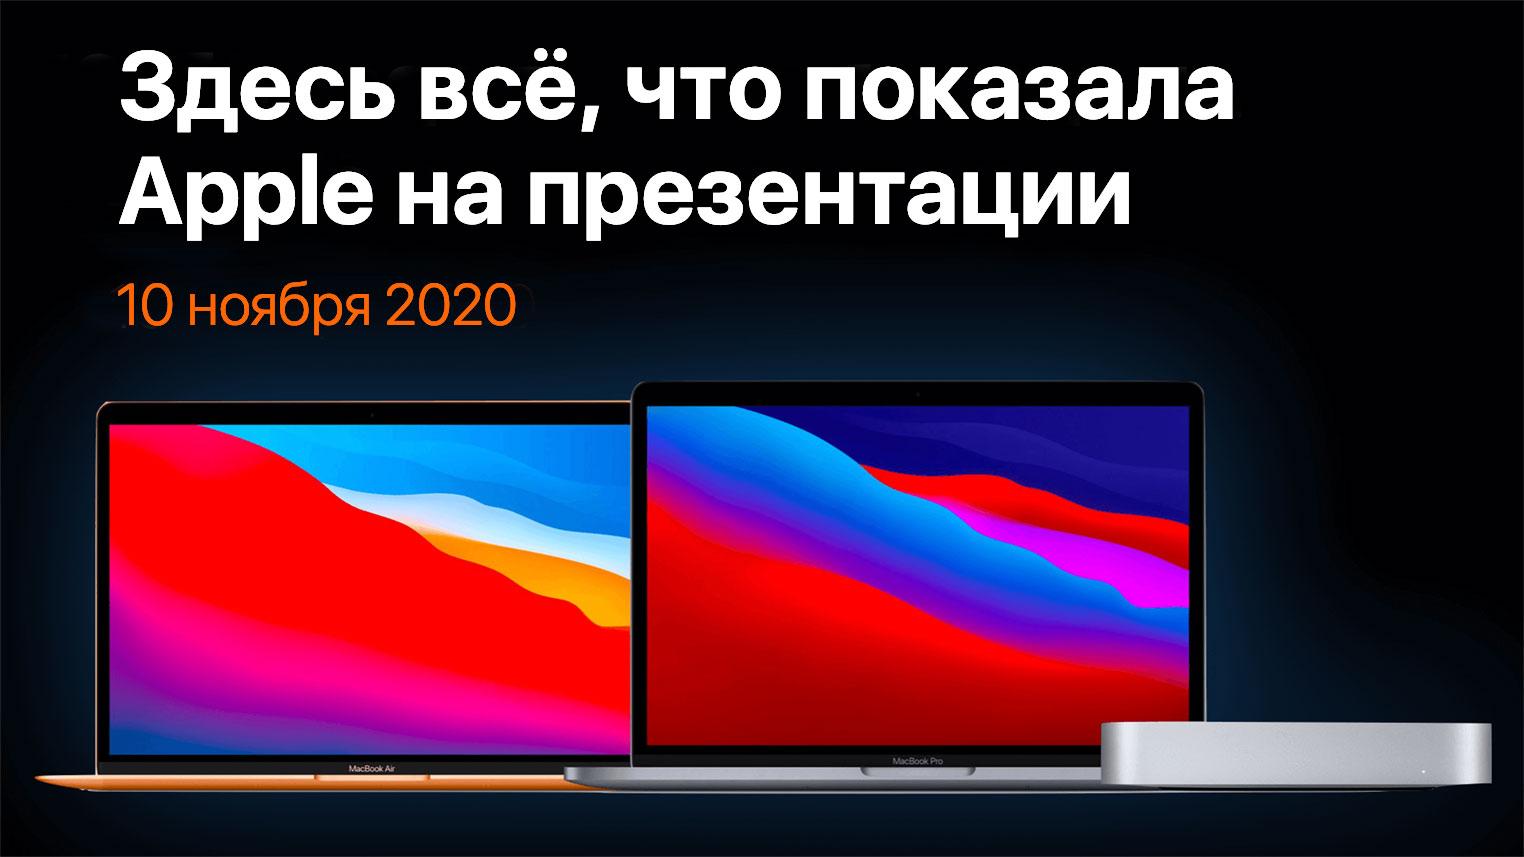 https://estore.ua/media/post/image/_/2/_2020-11-11_01.49.42.jpg